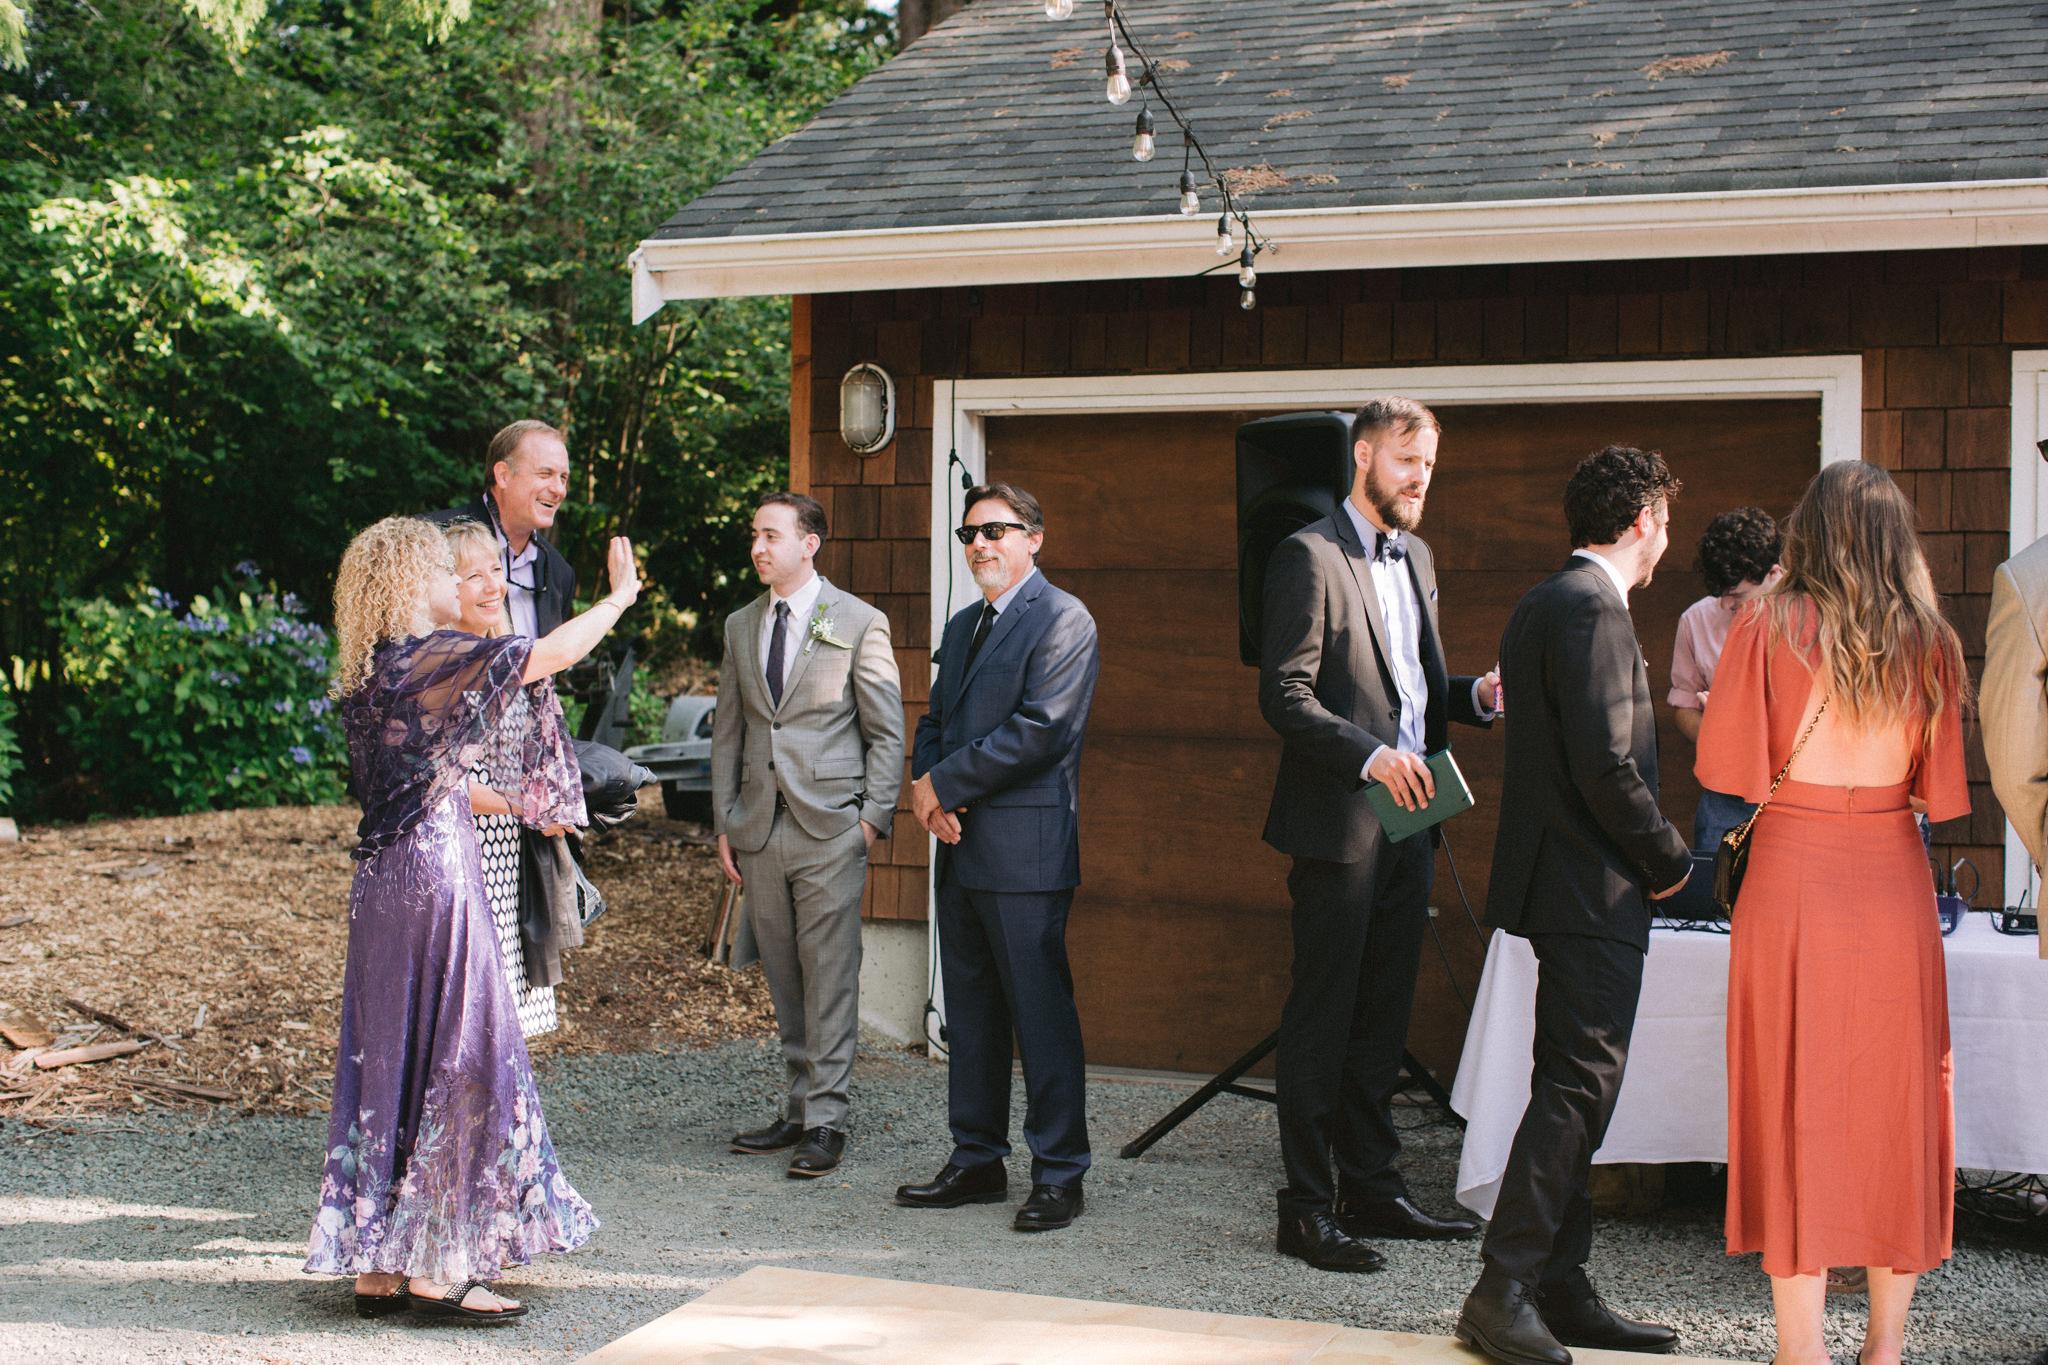 Backyard-Bainbridge-Island-Wedding-Alycia-Lovell-Photography-70.JPG